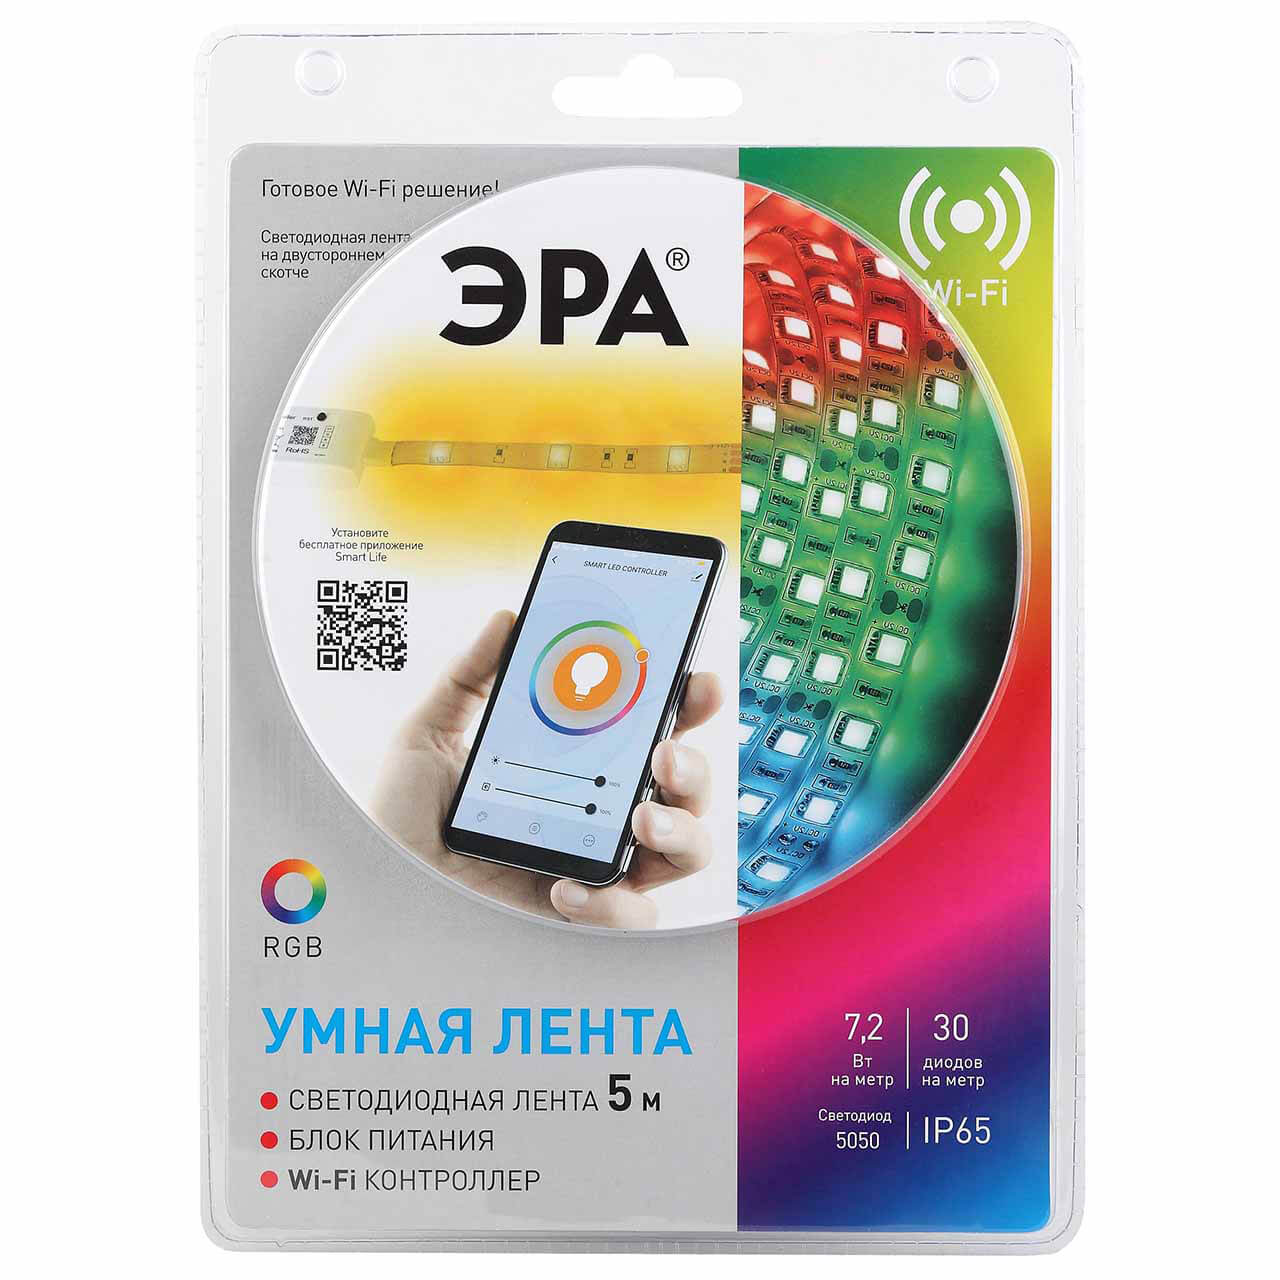 Светодиодная лента ЭРА 5050-30-RGB-IP65-Wifi-5m (12V) (Управление по Bluetooth)